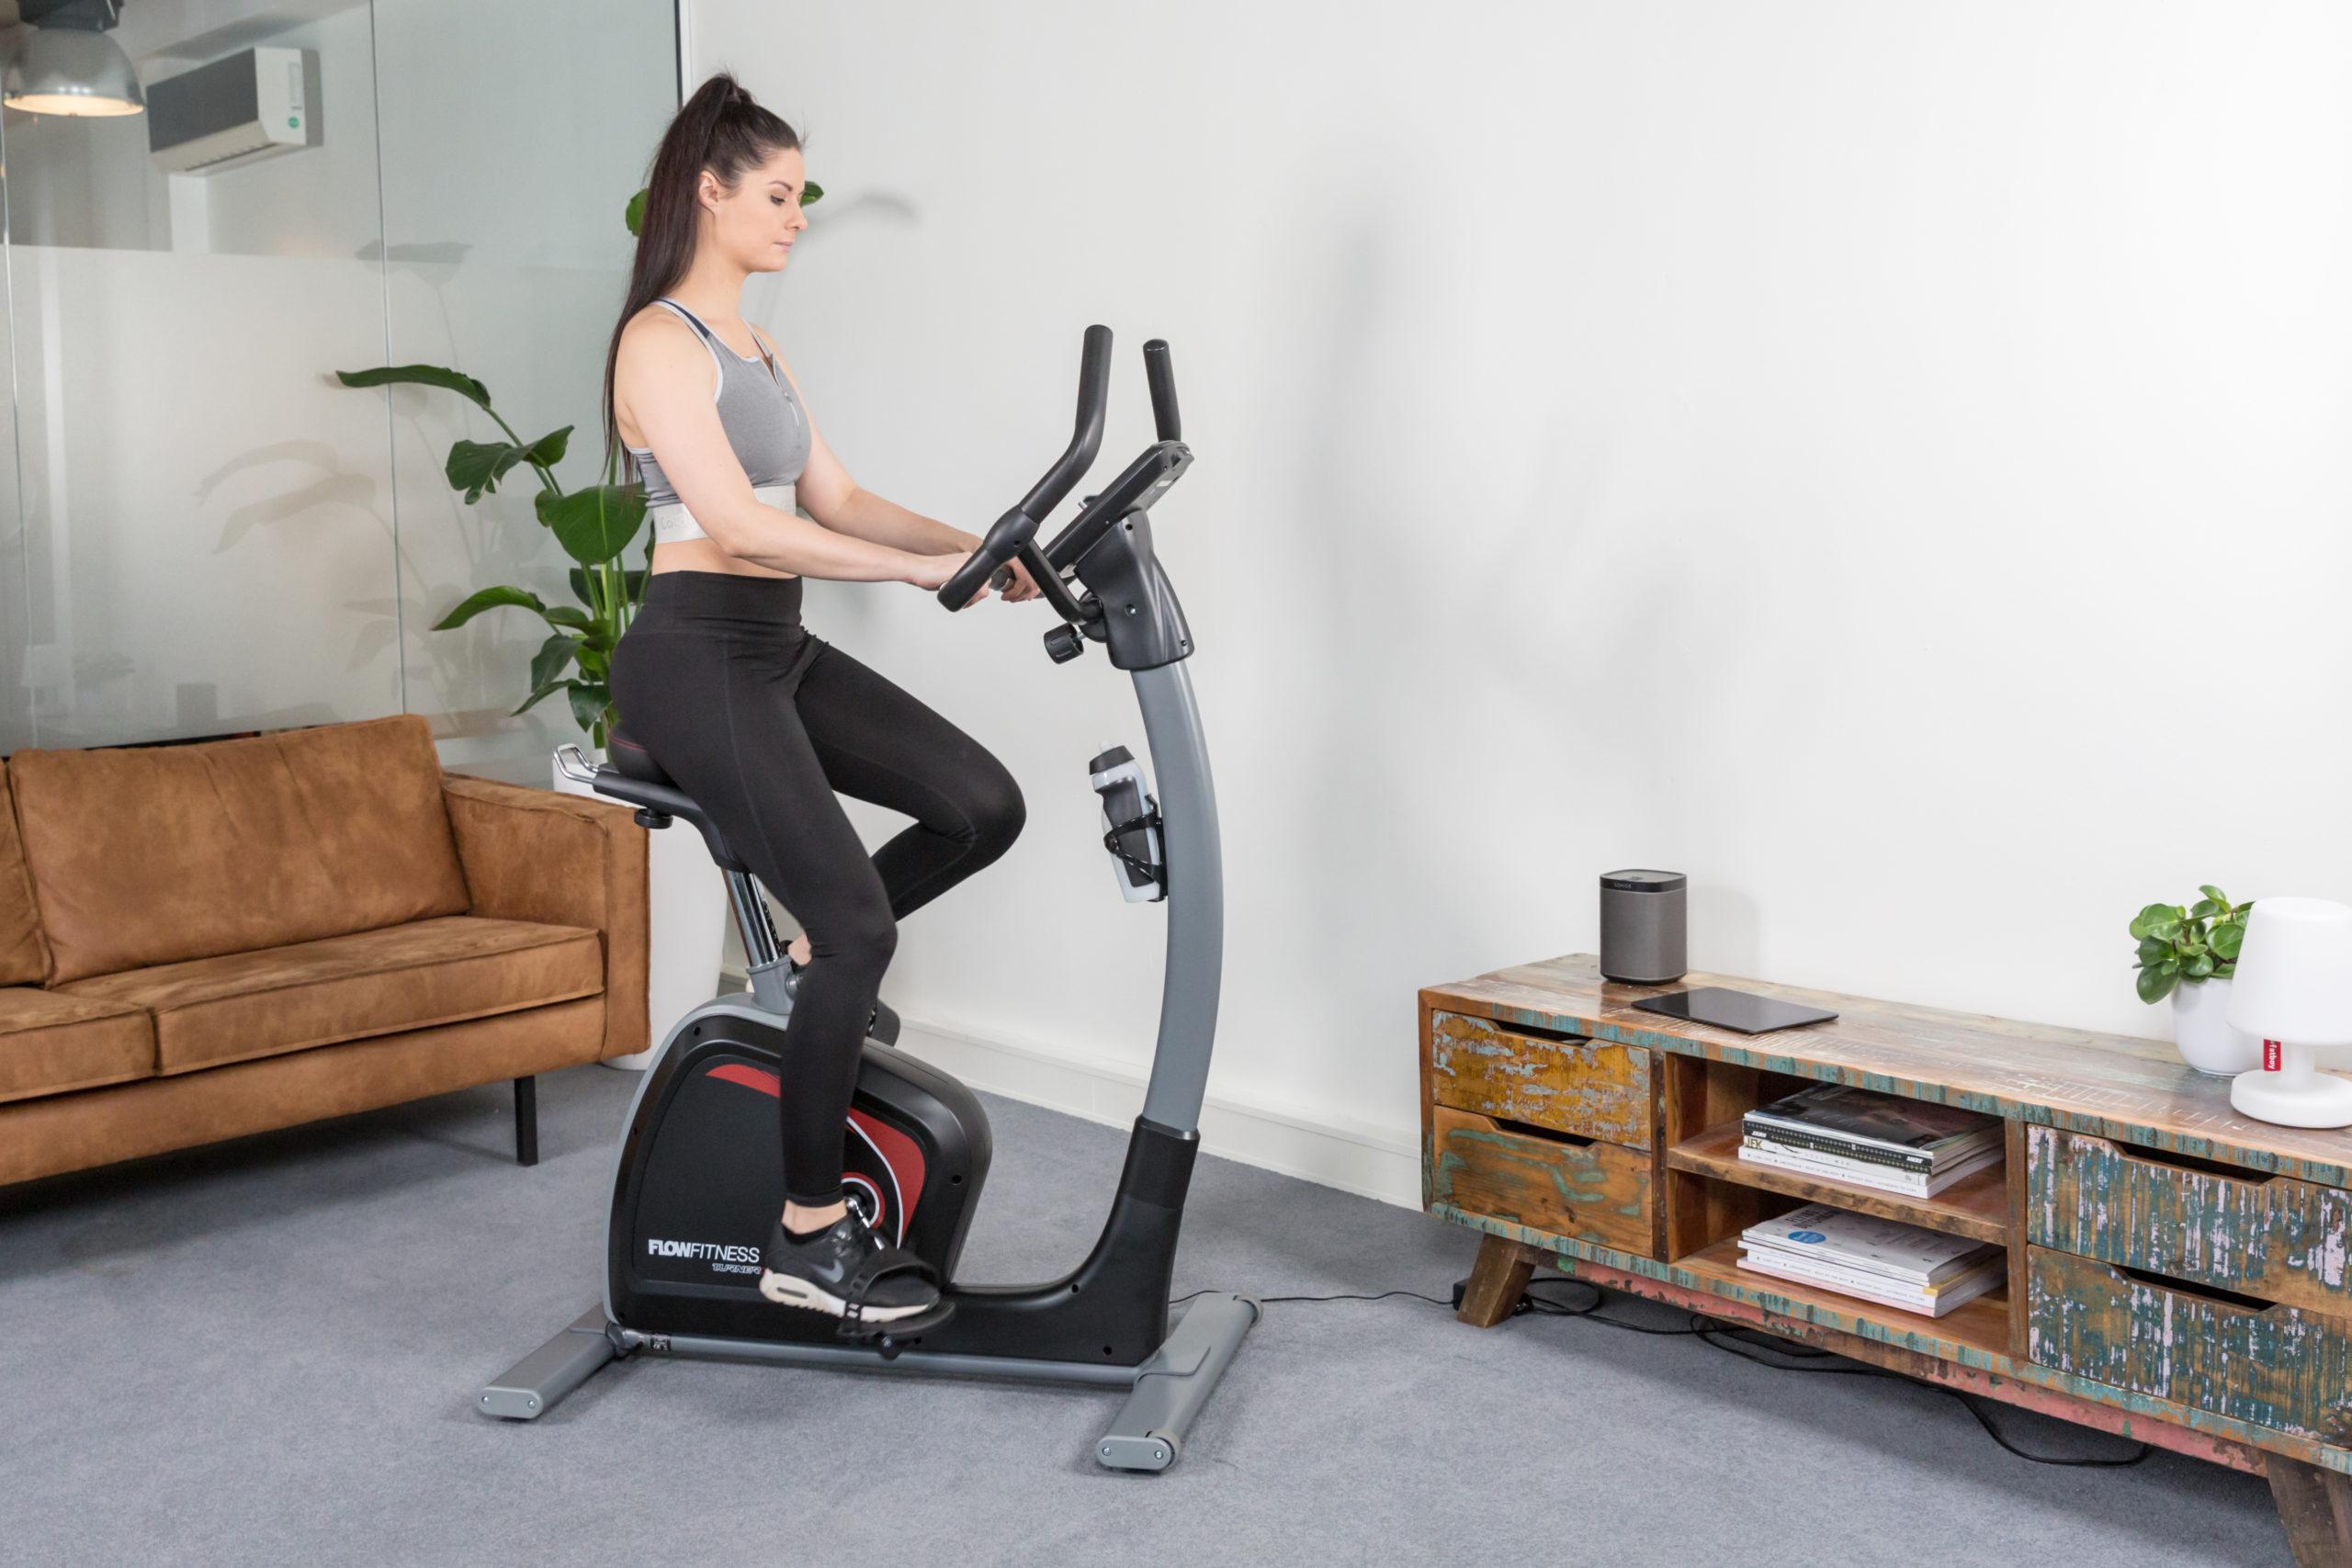 Flow Fitness Tabel Turner DHT2500i Hometrainer 12